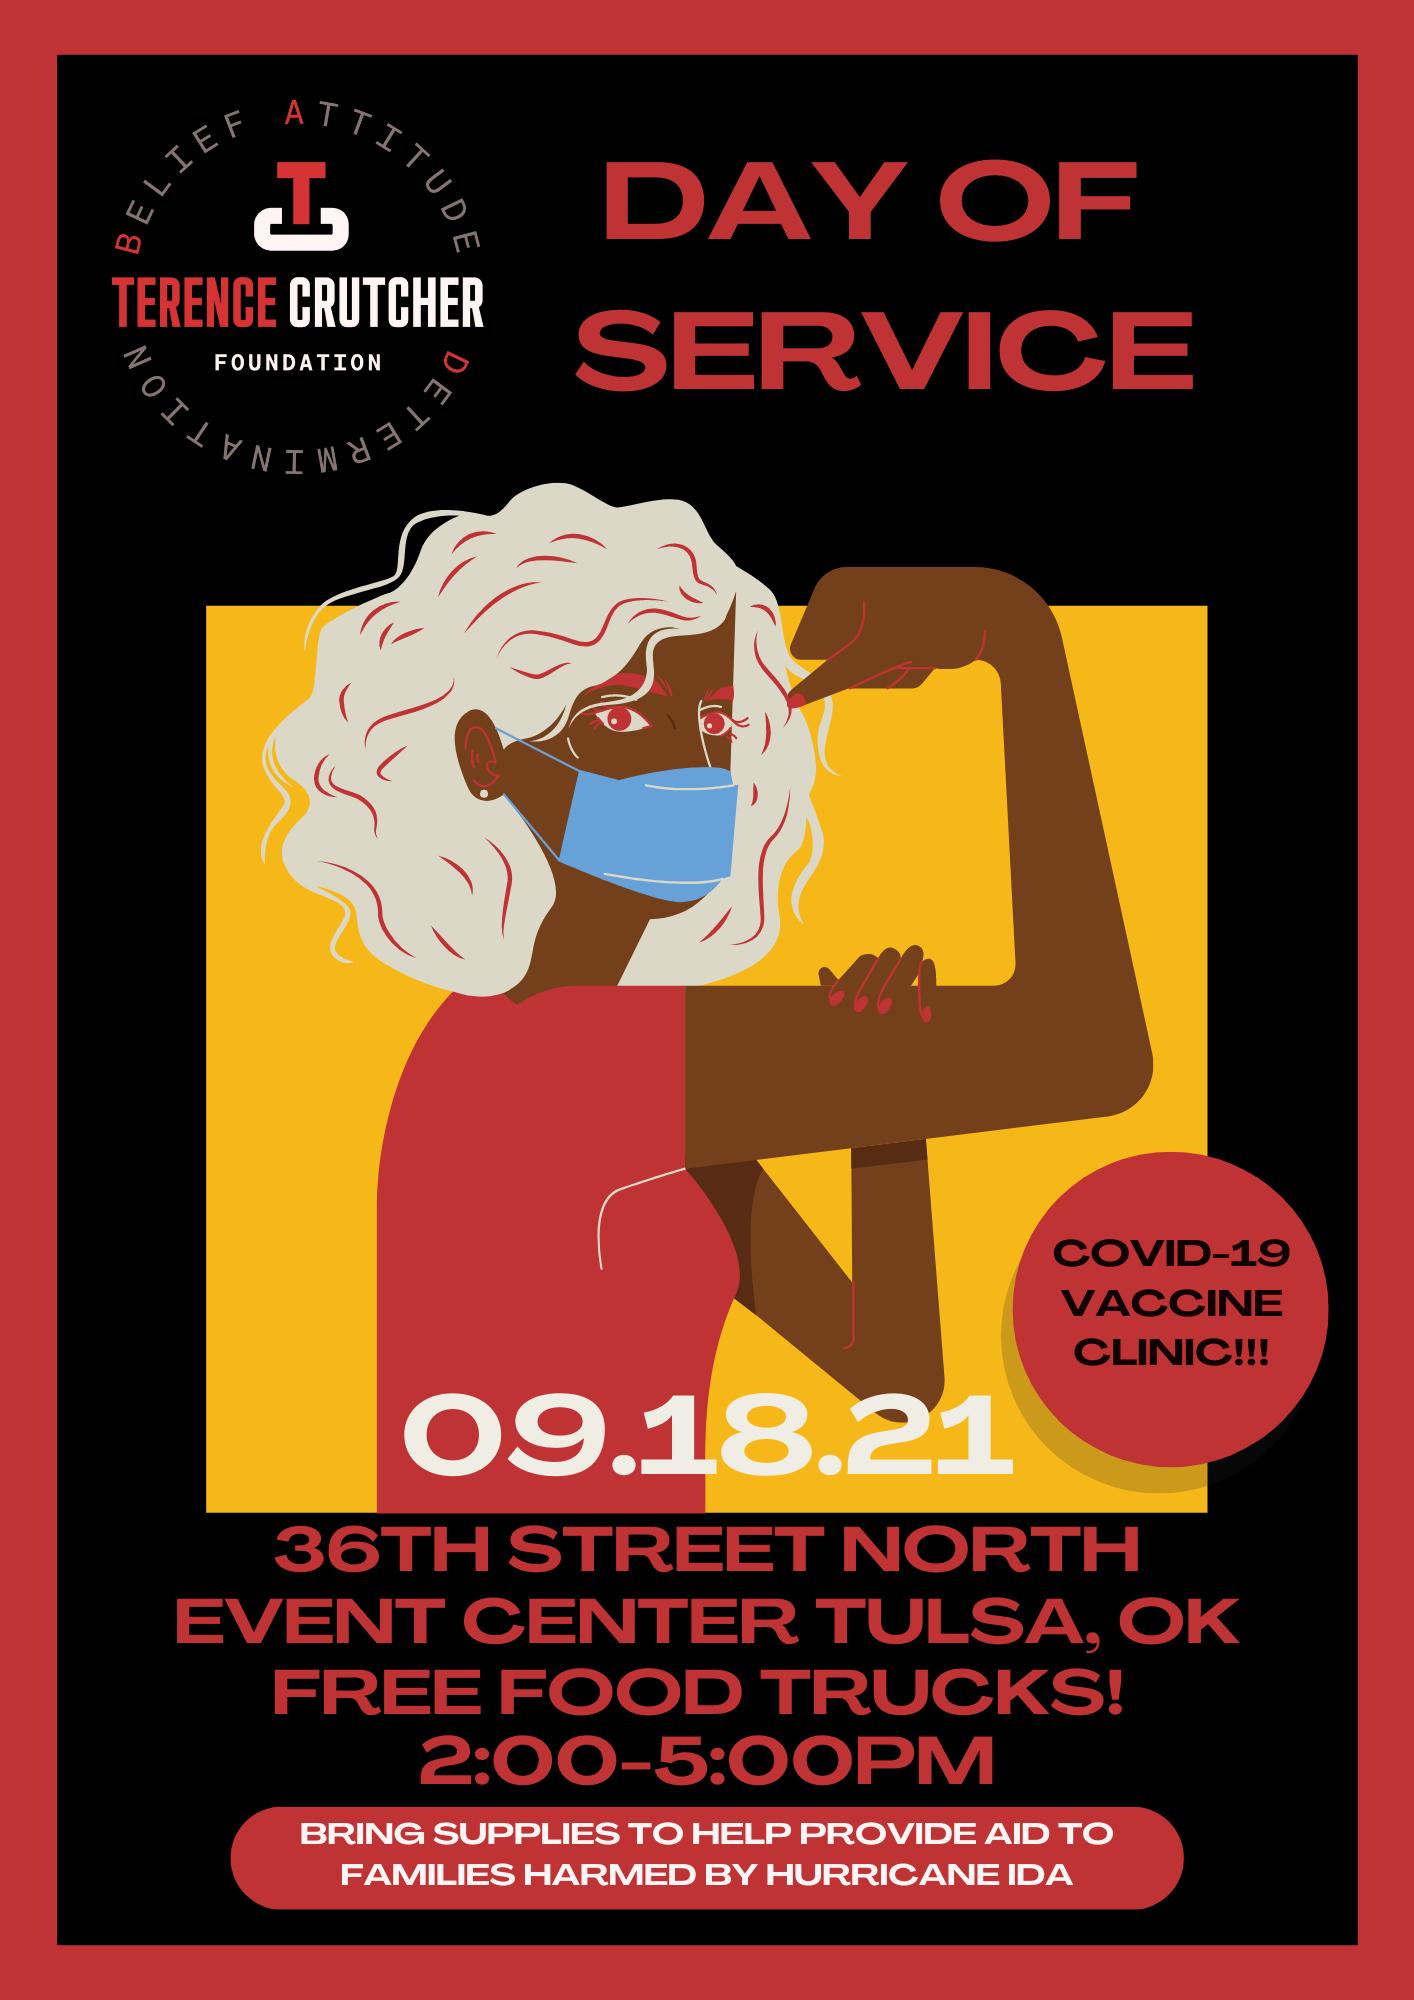 36 Street North Event Center